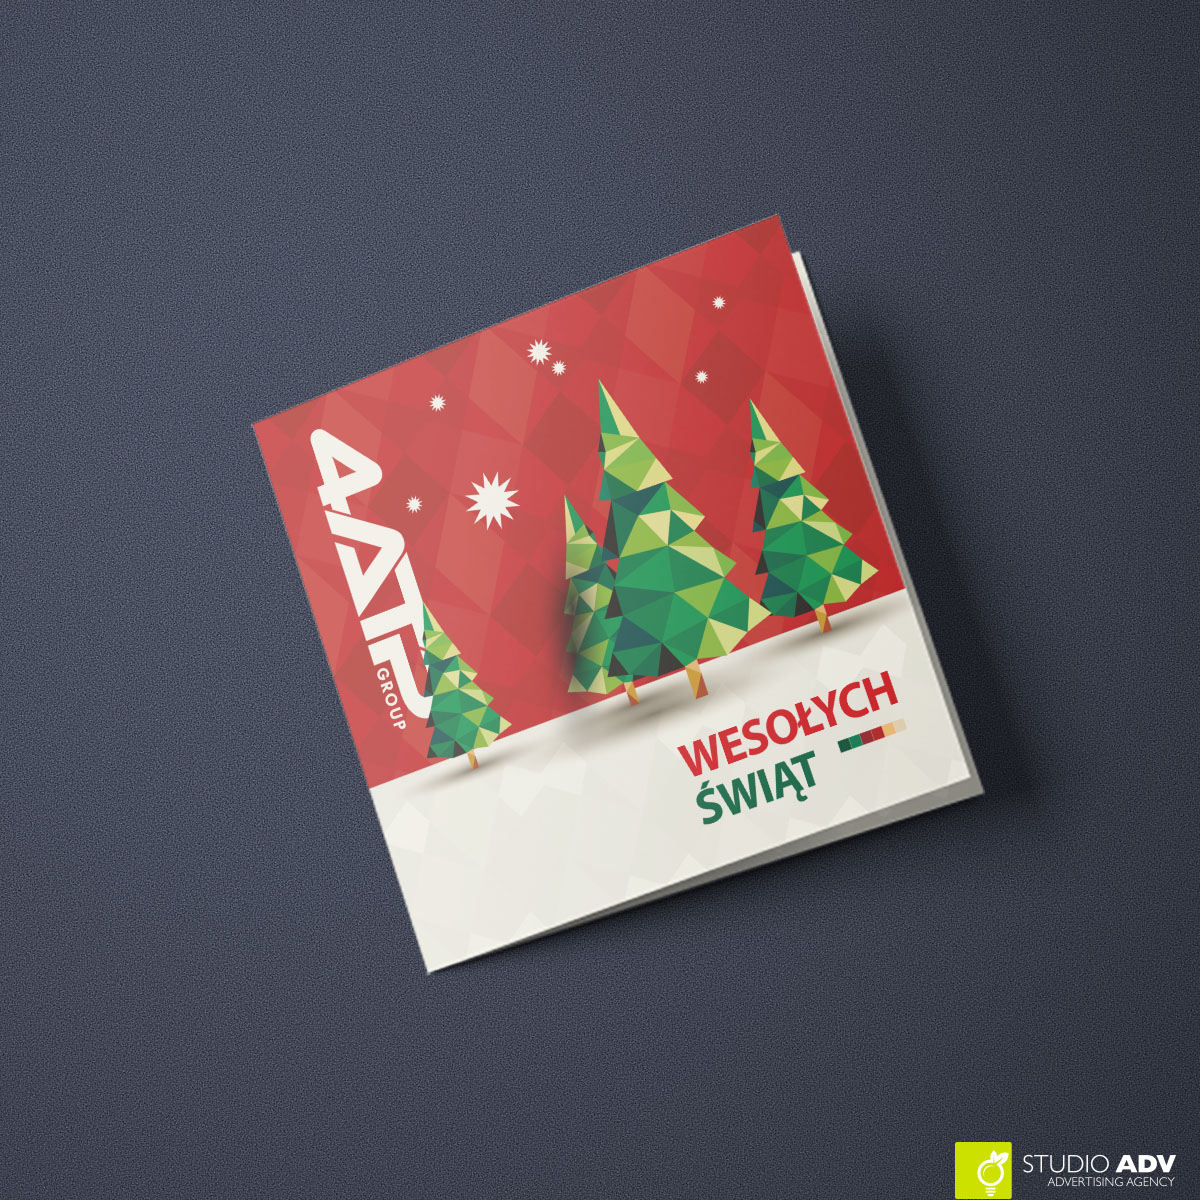 Studio ADV - 4ATP